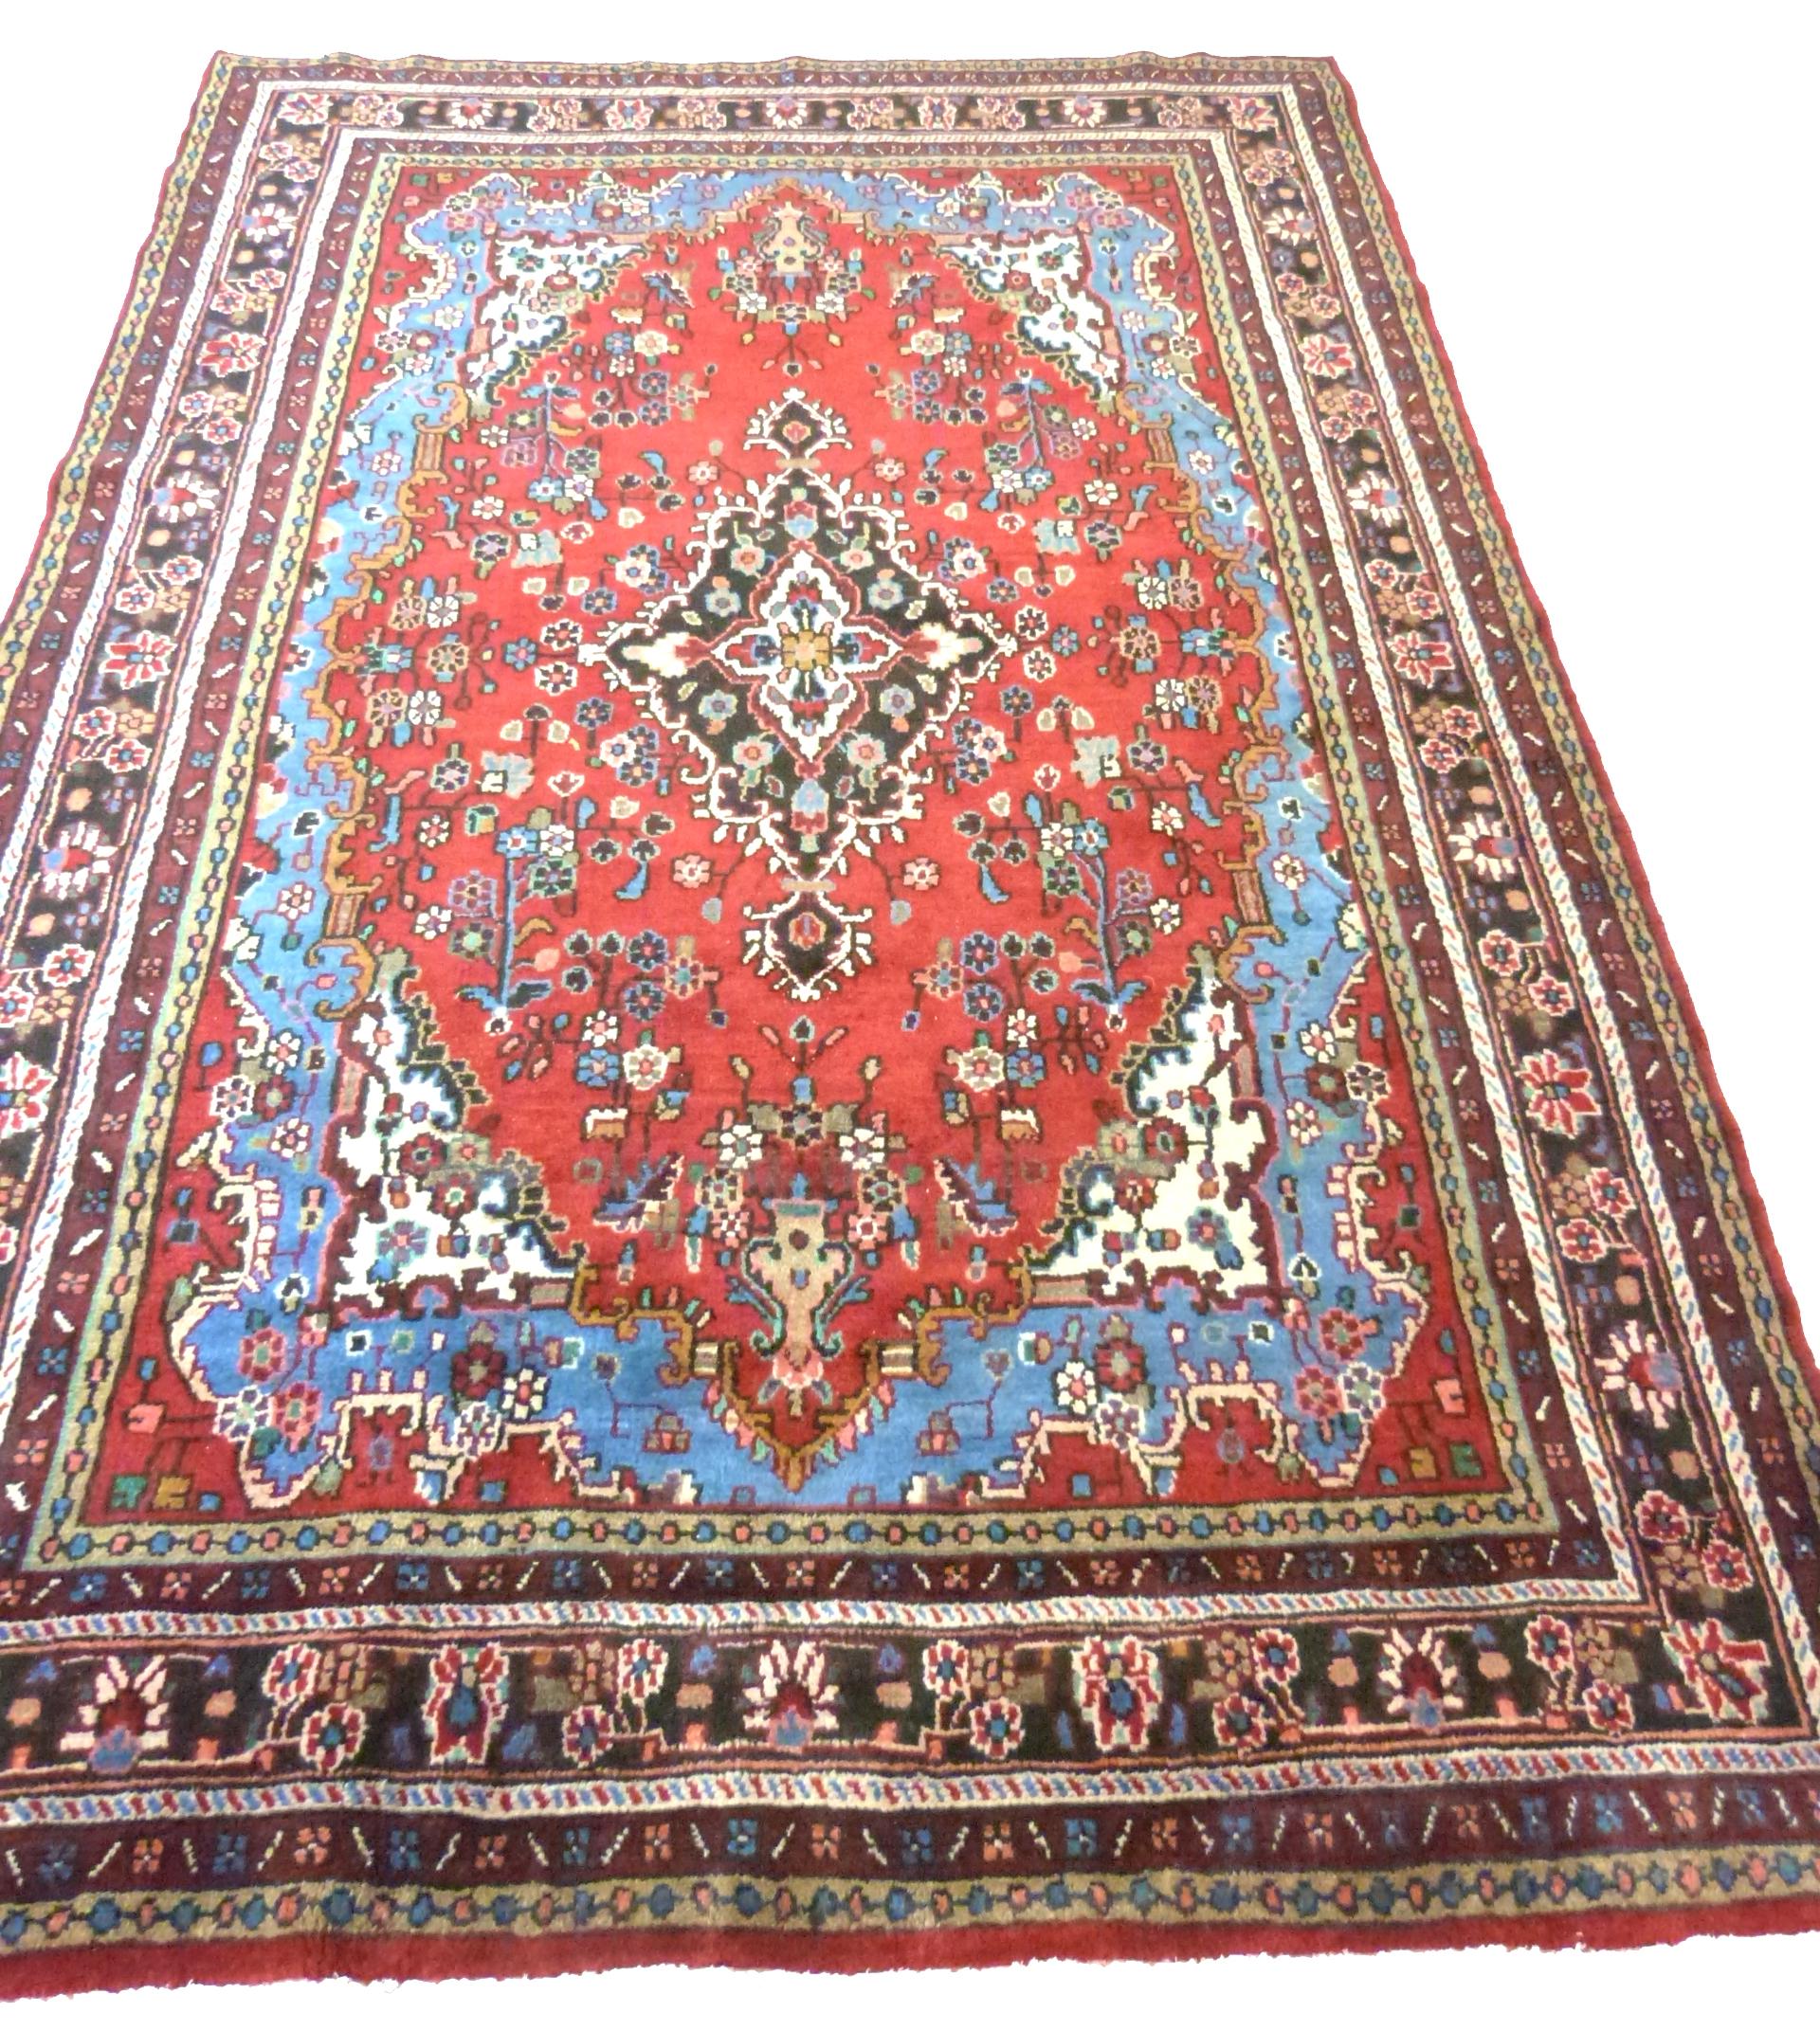 Rich red ground full pile Persian Serouke Carpet, floral medallion design 296cm x 200cm - Image 3 of 8